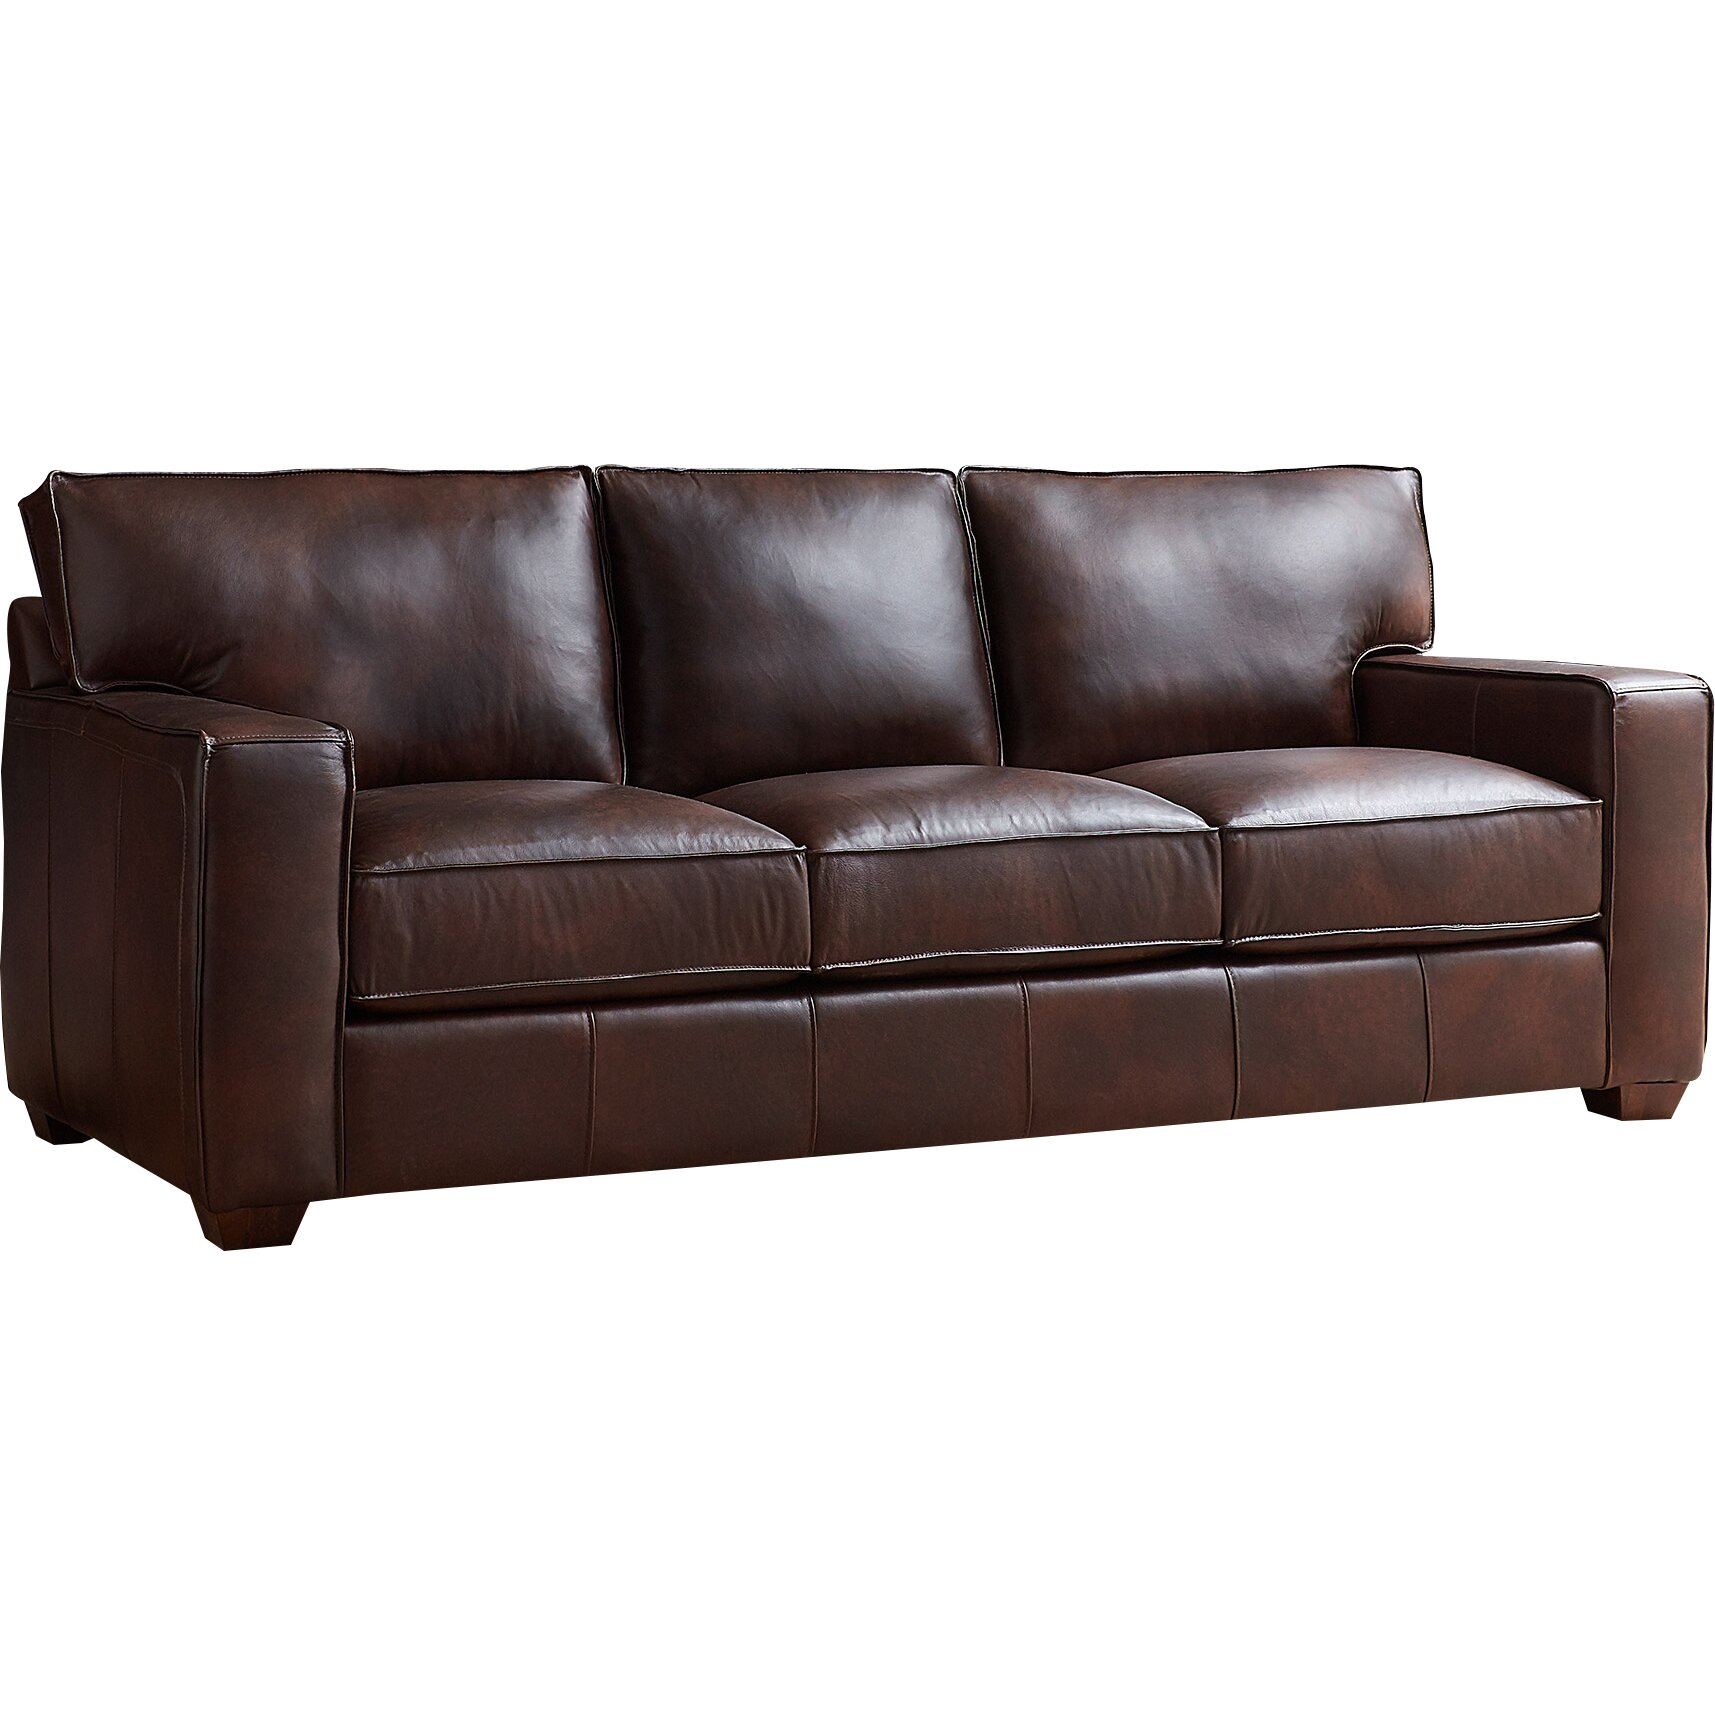 Sleeper sofas baton rouge sofa menzilperde net for Affordable furniture baton rouge